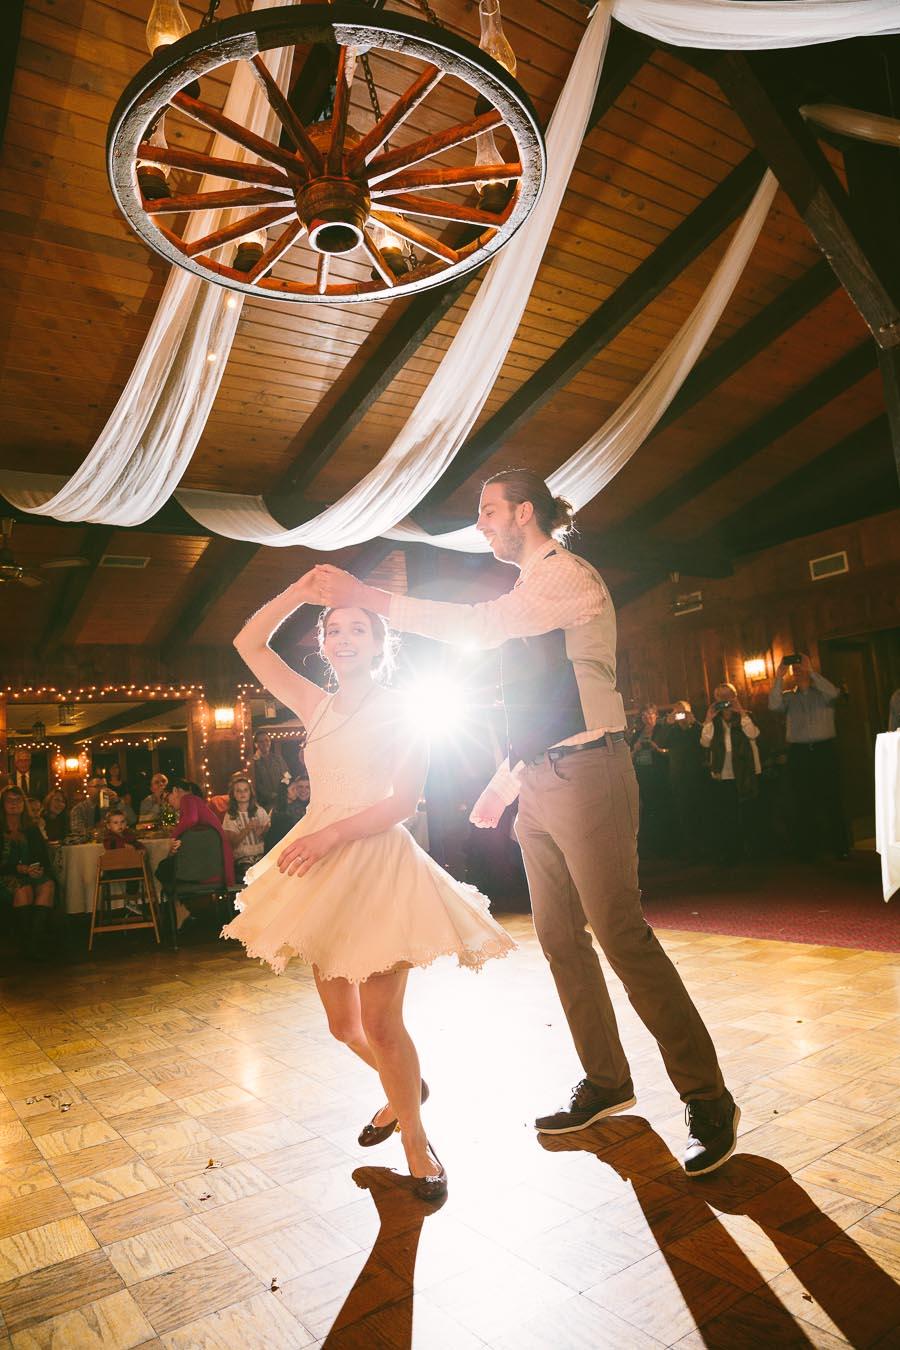 chesterland-ohio-wedding-photography-orchard-hills-paterson-fruit-farm-33.jpg